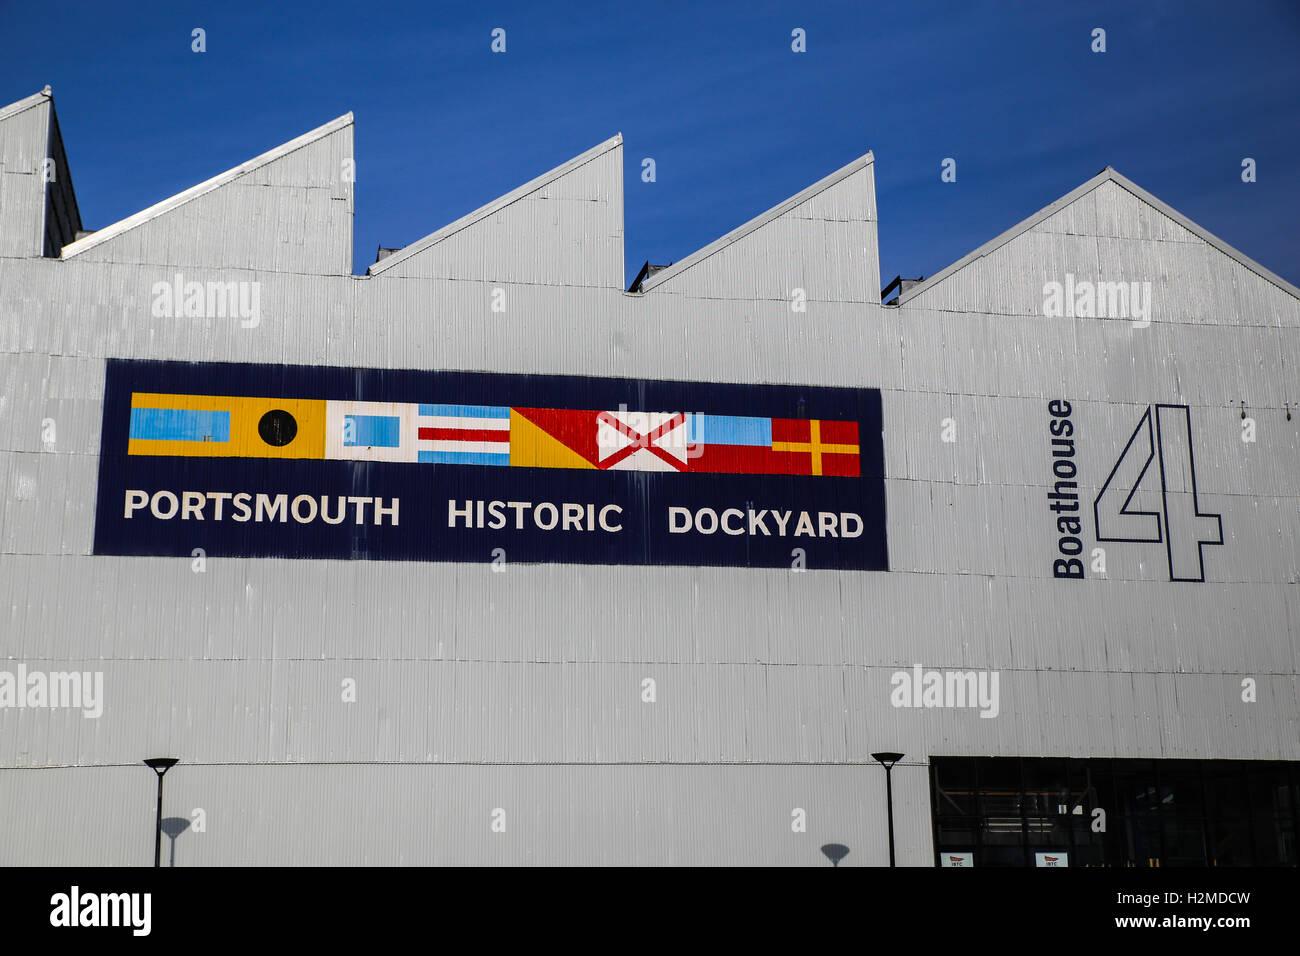 Portsmouth Historic Dockyard sign - Stock Image